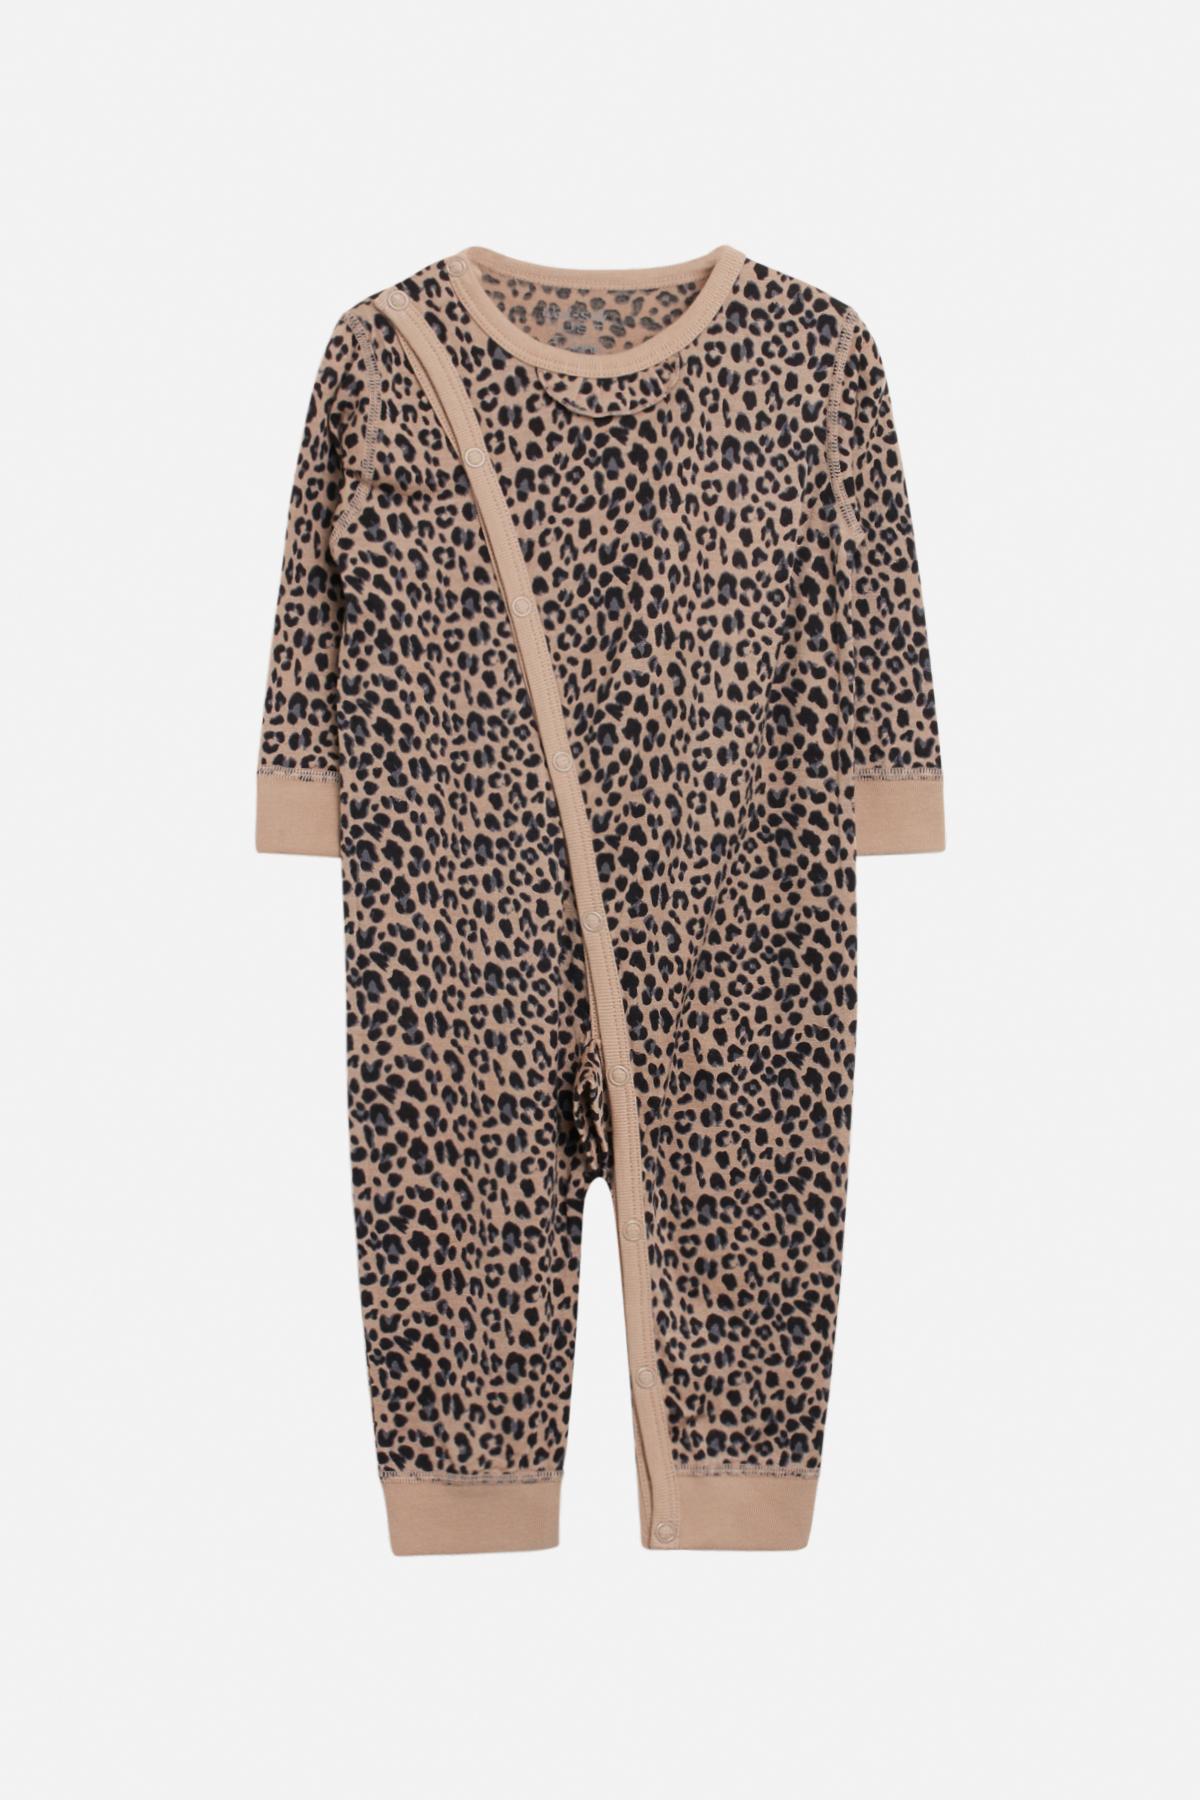 Wool/Silk - Mija - Nightwear